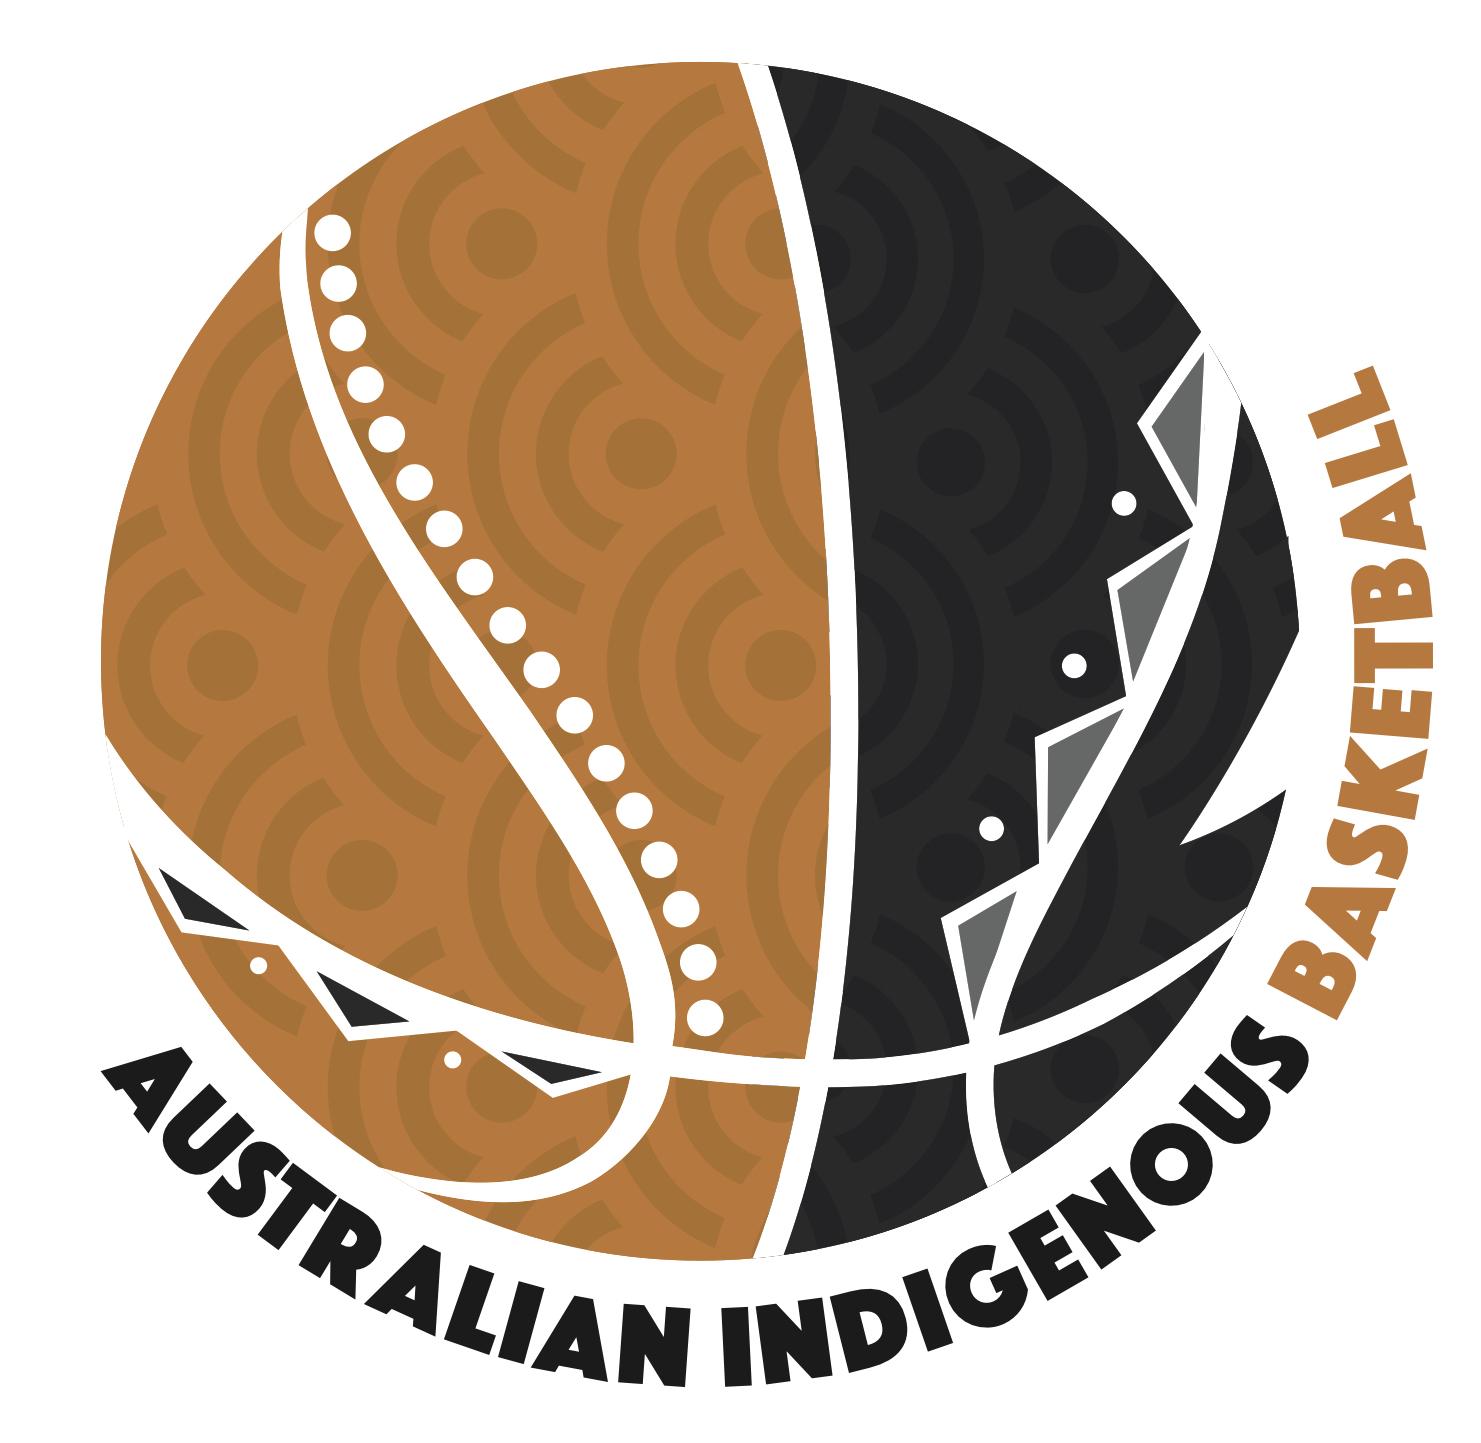 Australian Indigenous Basketball Corporate Logo.jpg